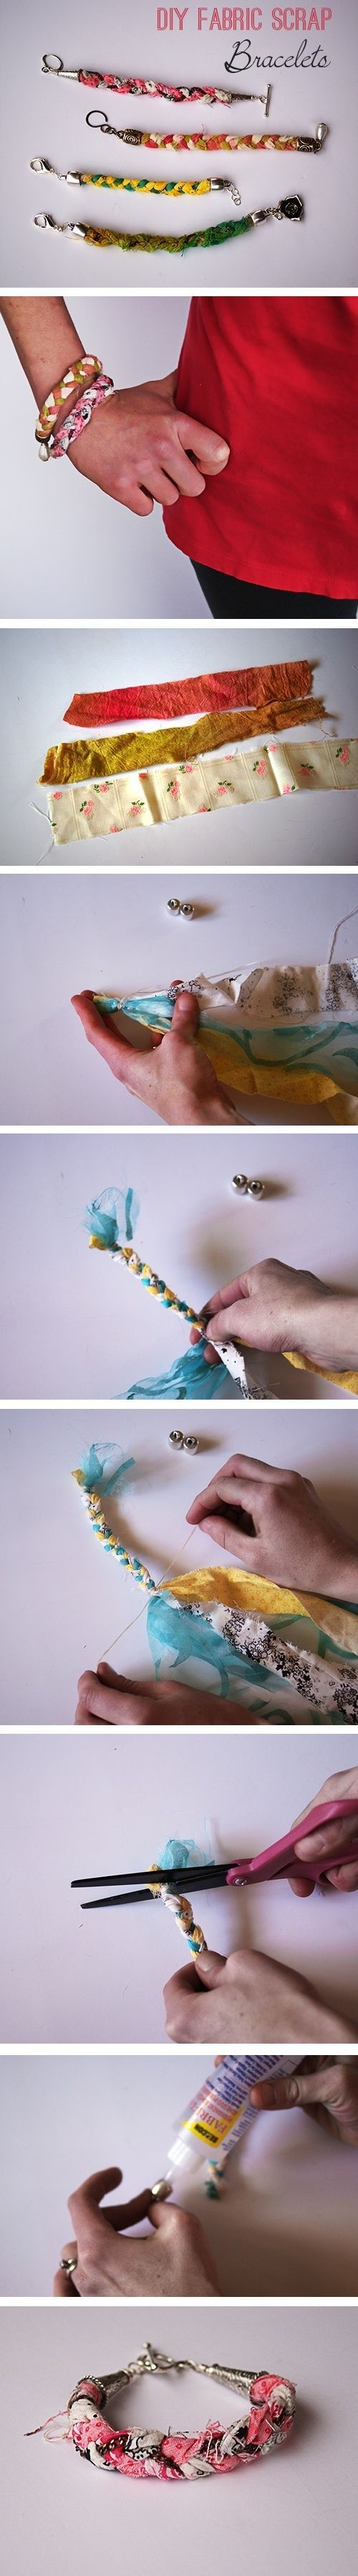 diy,diy bracelet,diy fabric scrap bracelet